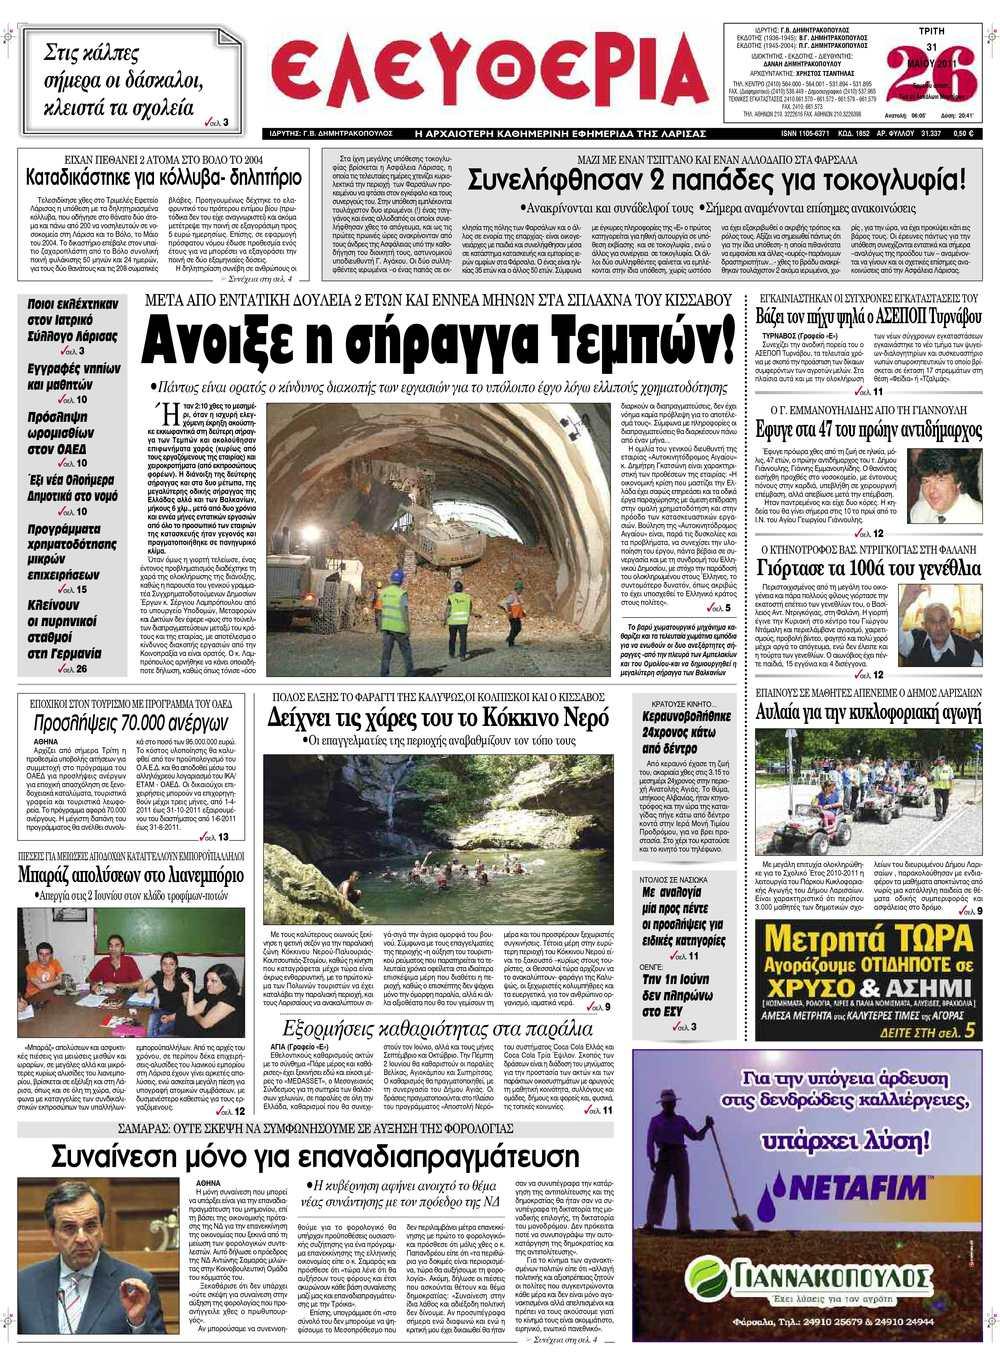 Calaméo - Eleftheria.gr 31 5 2011 77ec98c9840